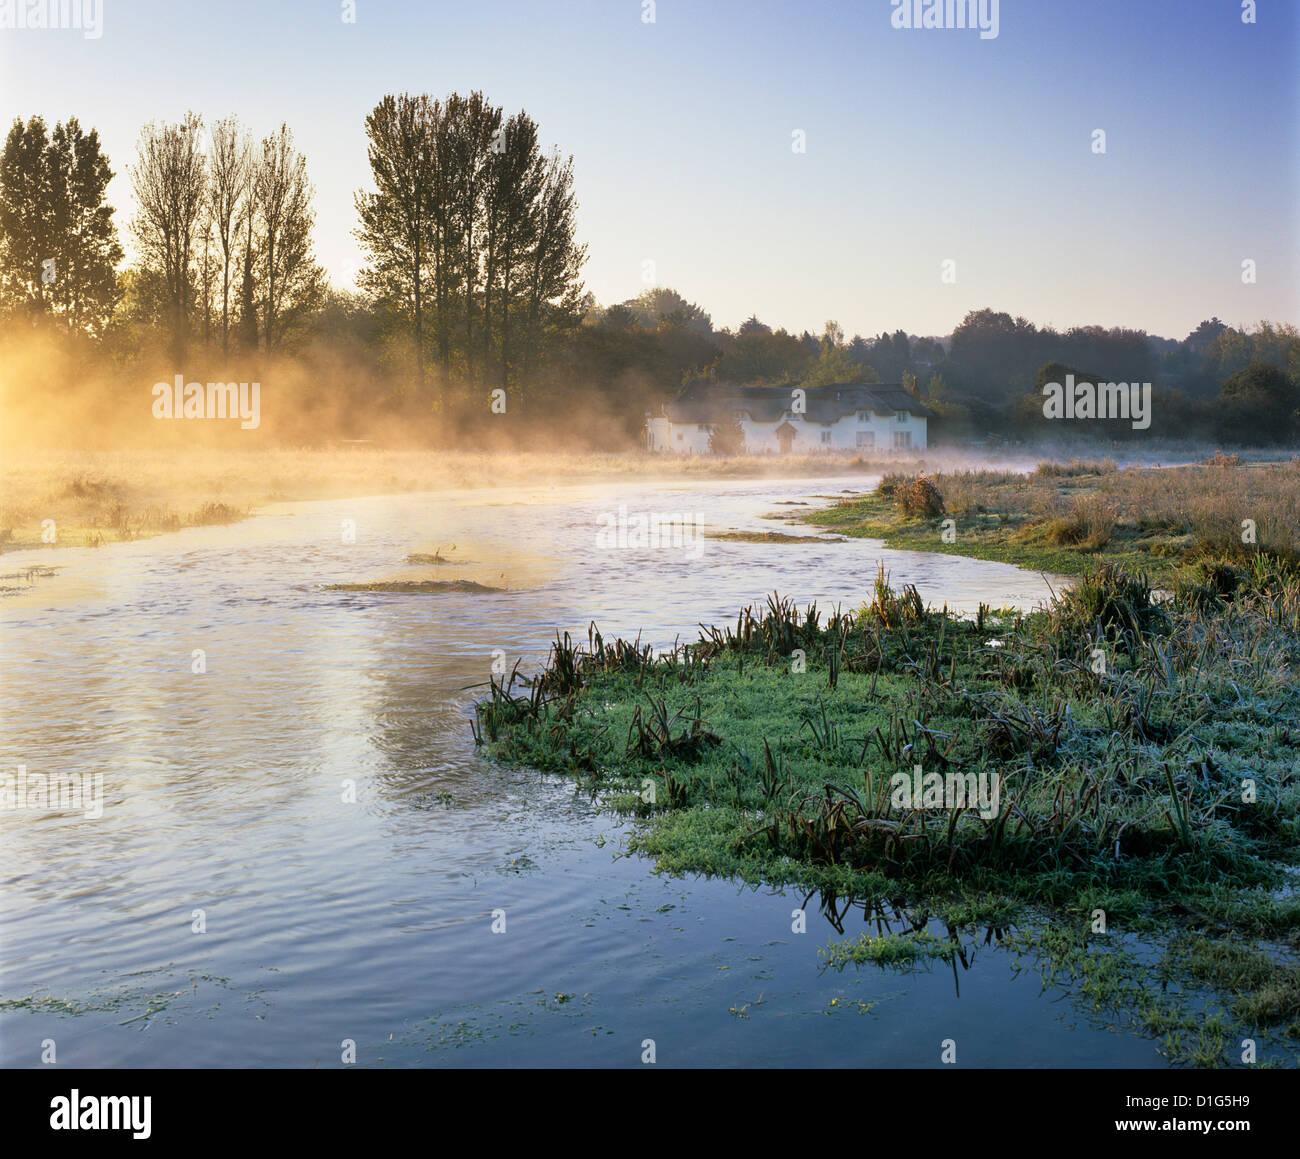 Misty River Test sur commune Chilbolton, Wherwell, Hampshire, Angleterre, Royaume-Uni, Europe Photo Stock